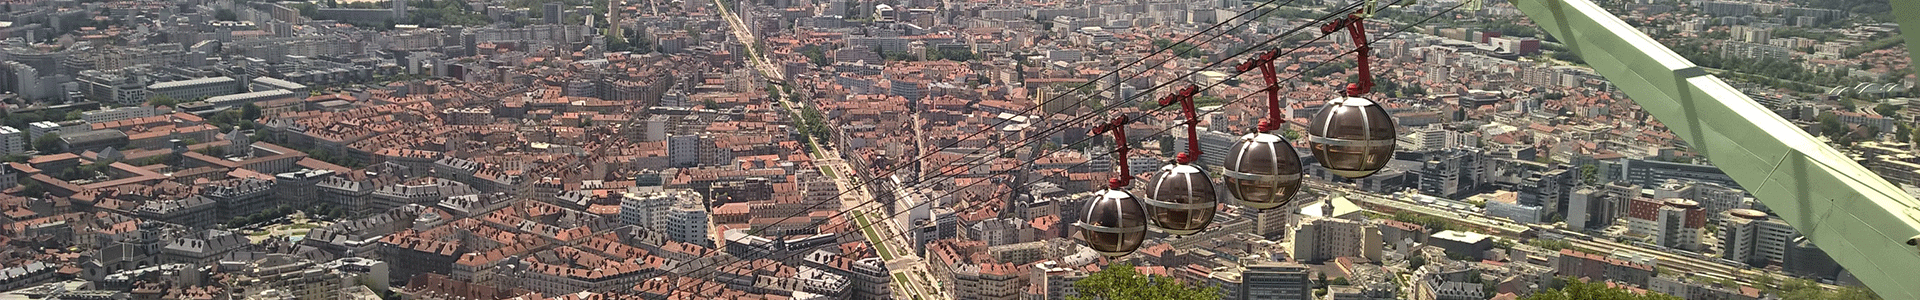 Meylan (Grenoble)